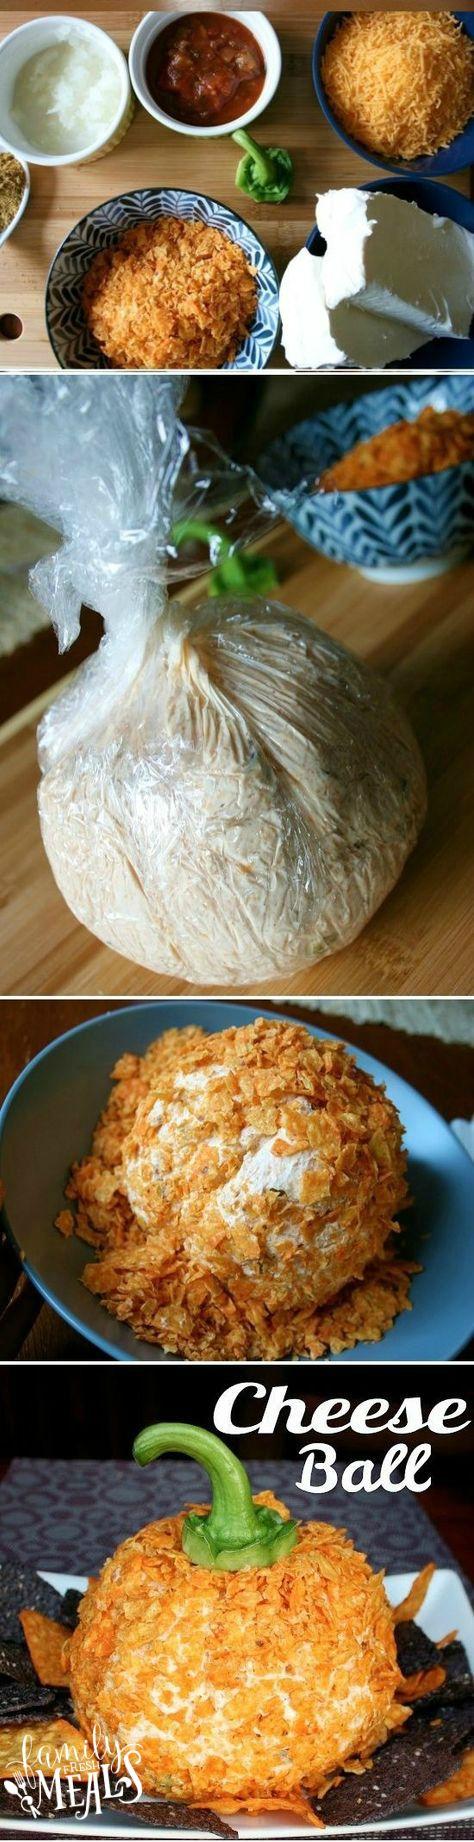 Easy Fall Cheese Ball Appetizer! Great for a Halloween Appetizer || FamilyFreshMeals.com #familyfreshmeals